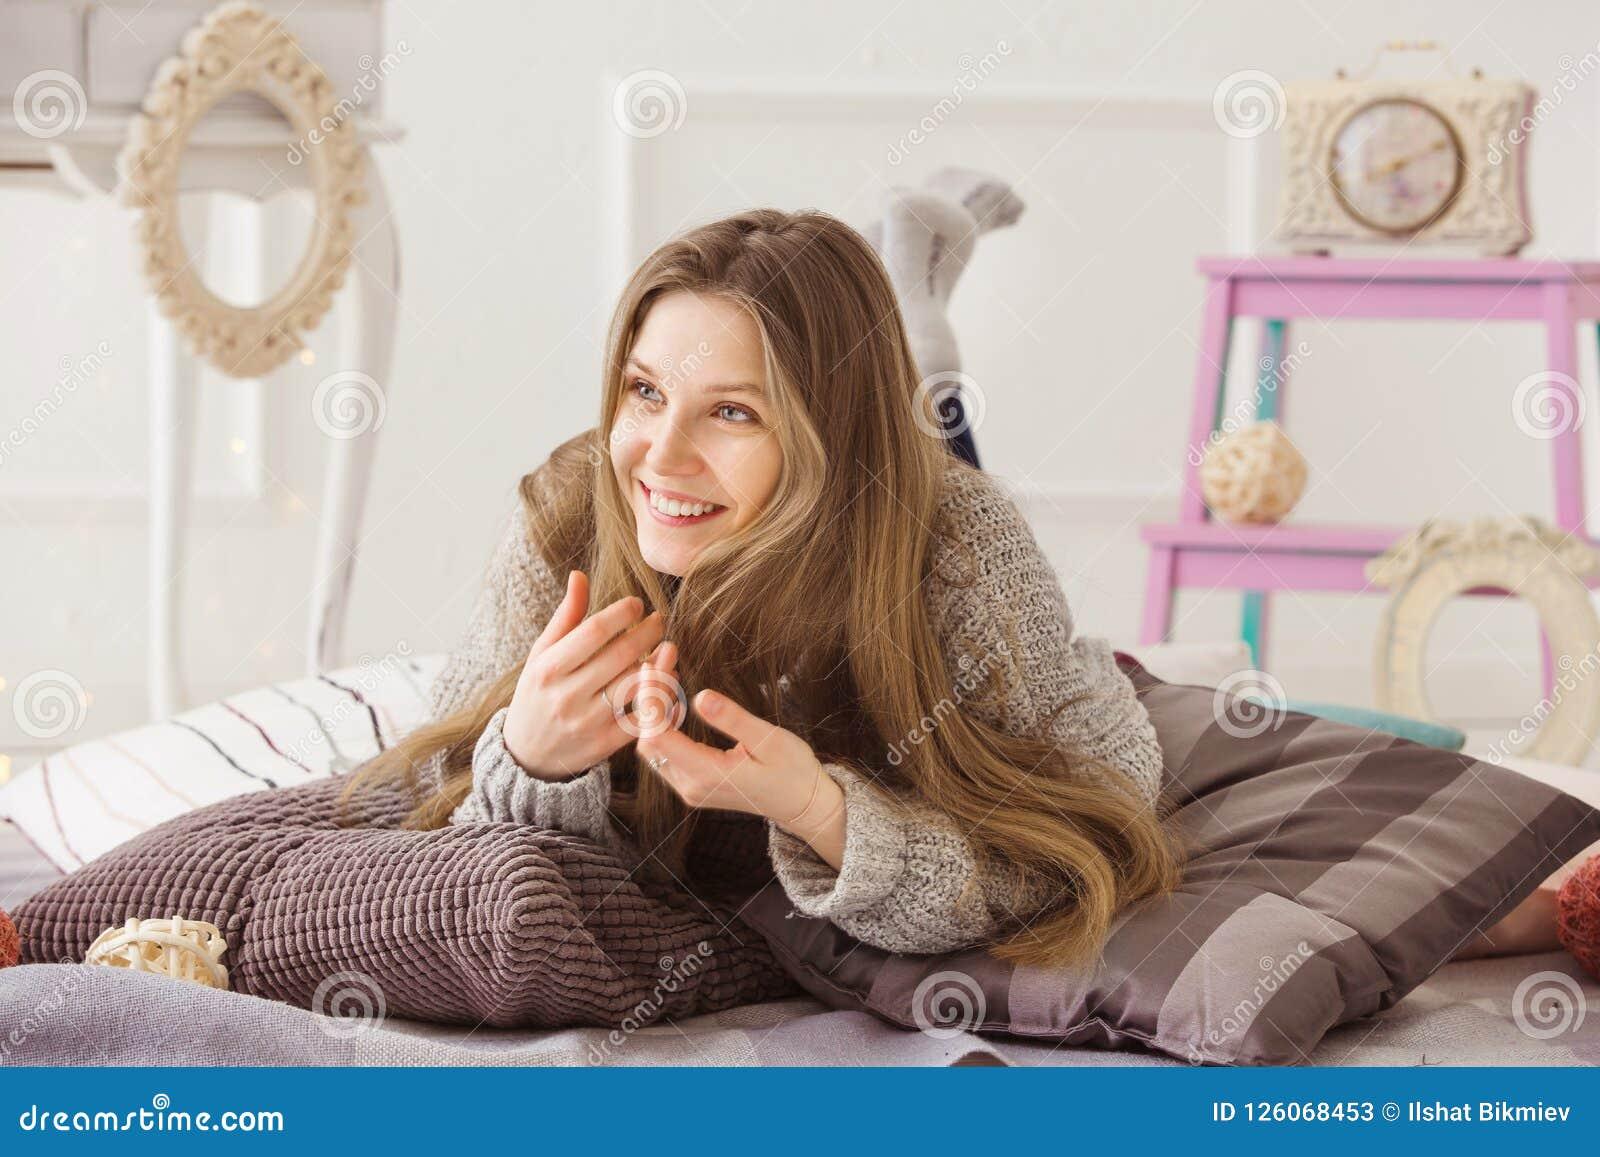 Фотосессия лежа на кровати #2